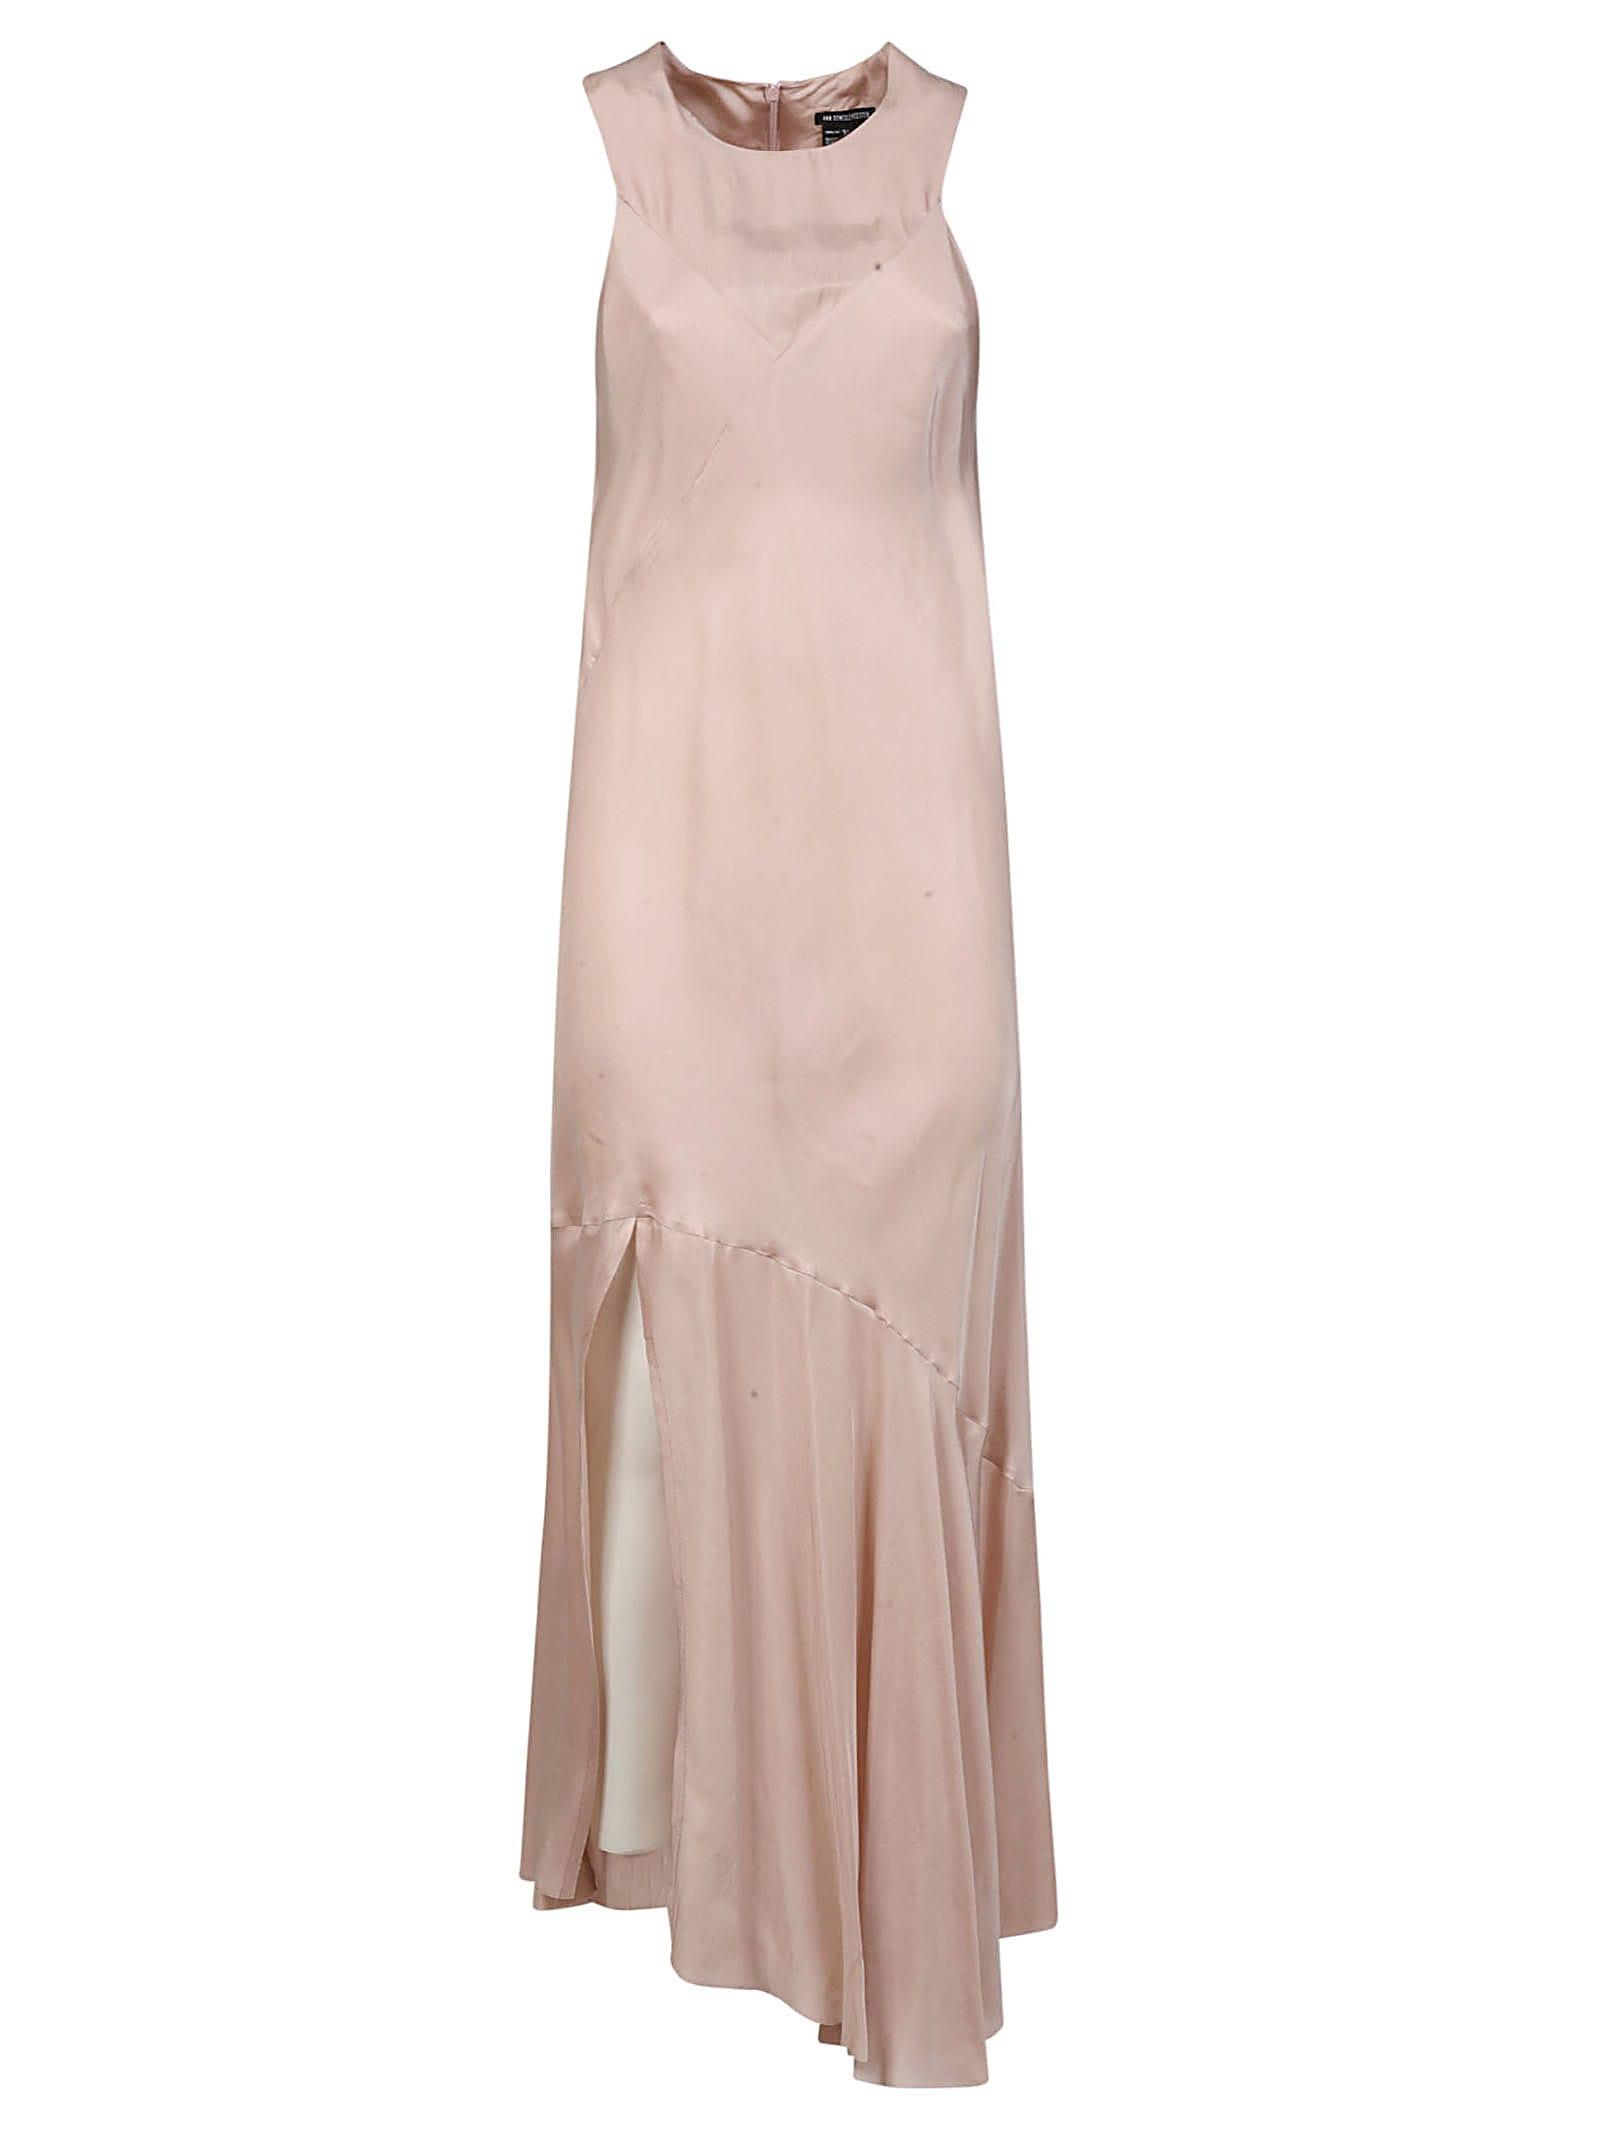 Buy Ann Demeulemeester Asymmetric Sleeveless Dress online, shop Ann Demeulemeester with free shipping